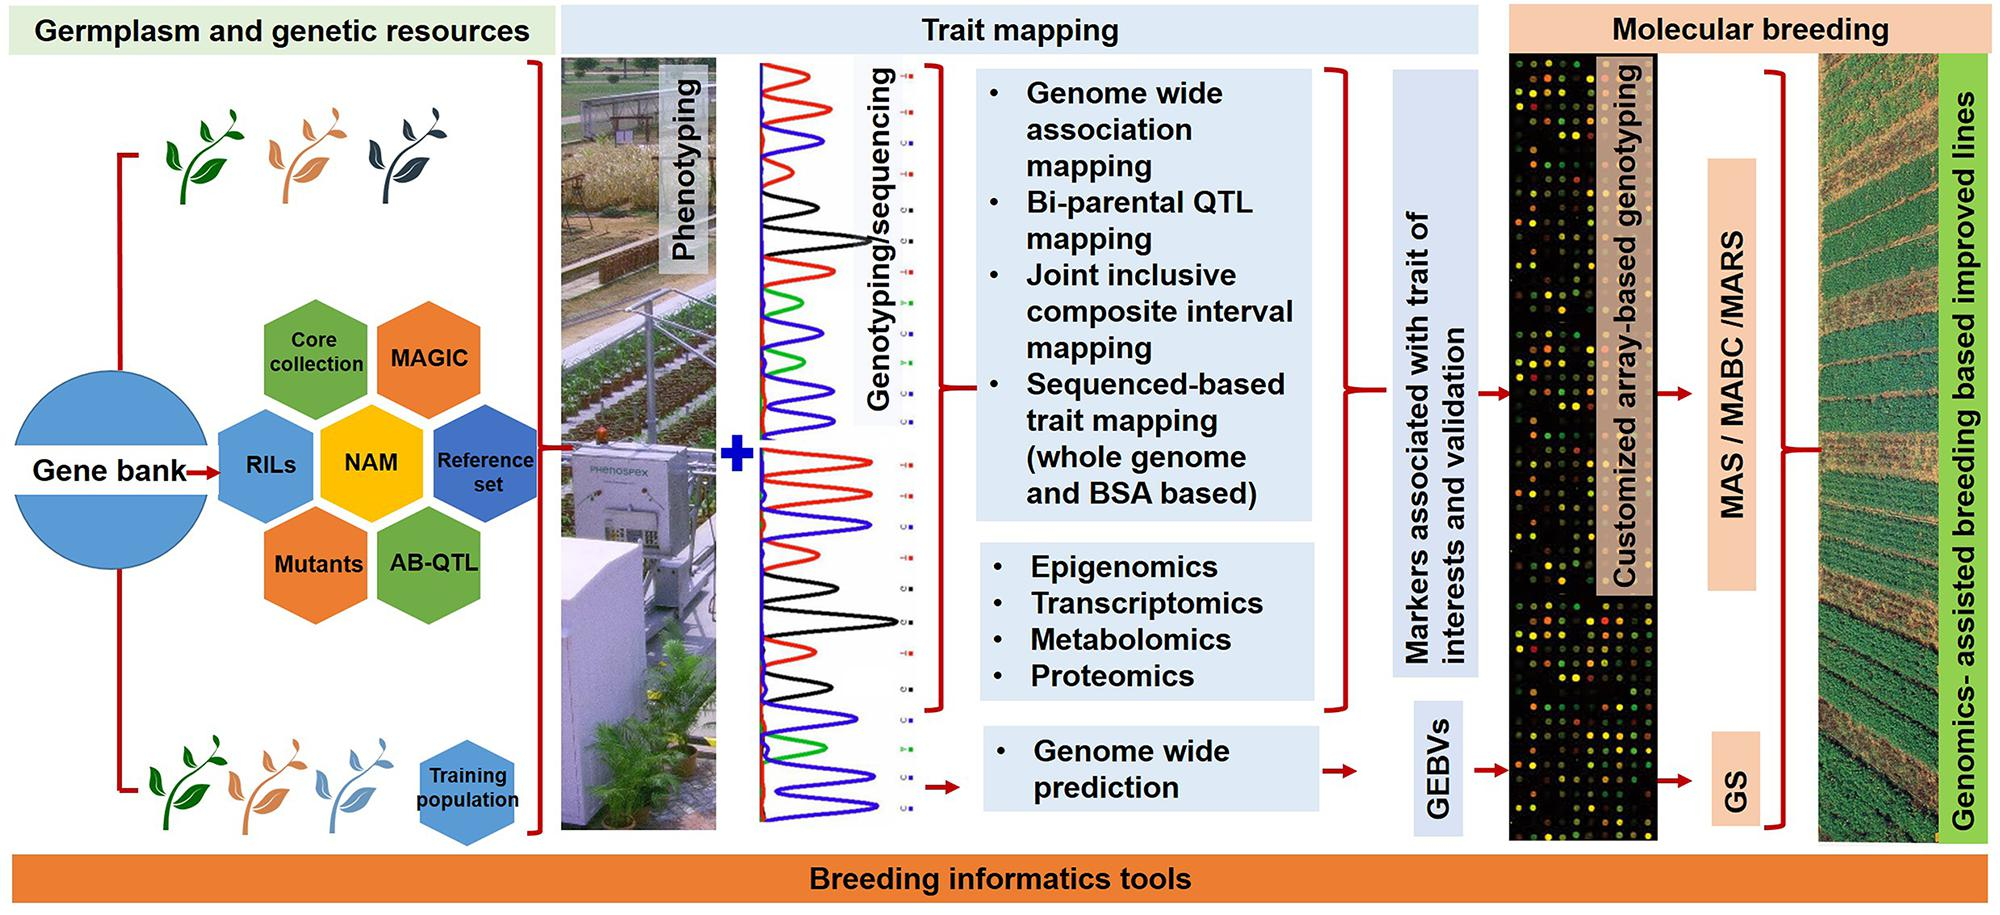 Frontiers | Emerging Genomic Tools for Legume Breeding ... on gene editing, gene concept map, gene technology, gene identification, gene testing, gene science, gene cloning, gene biology, gene drawing, gene linkage,